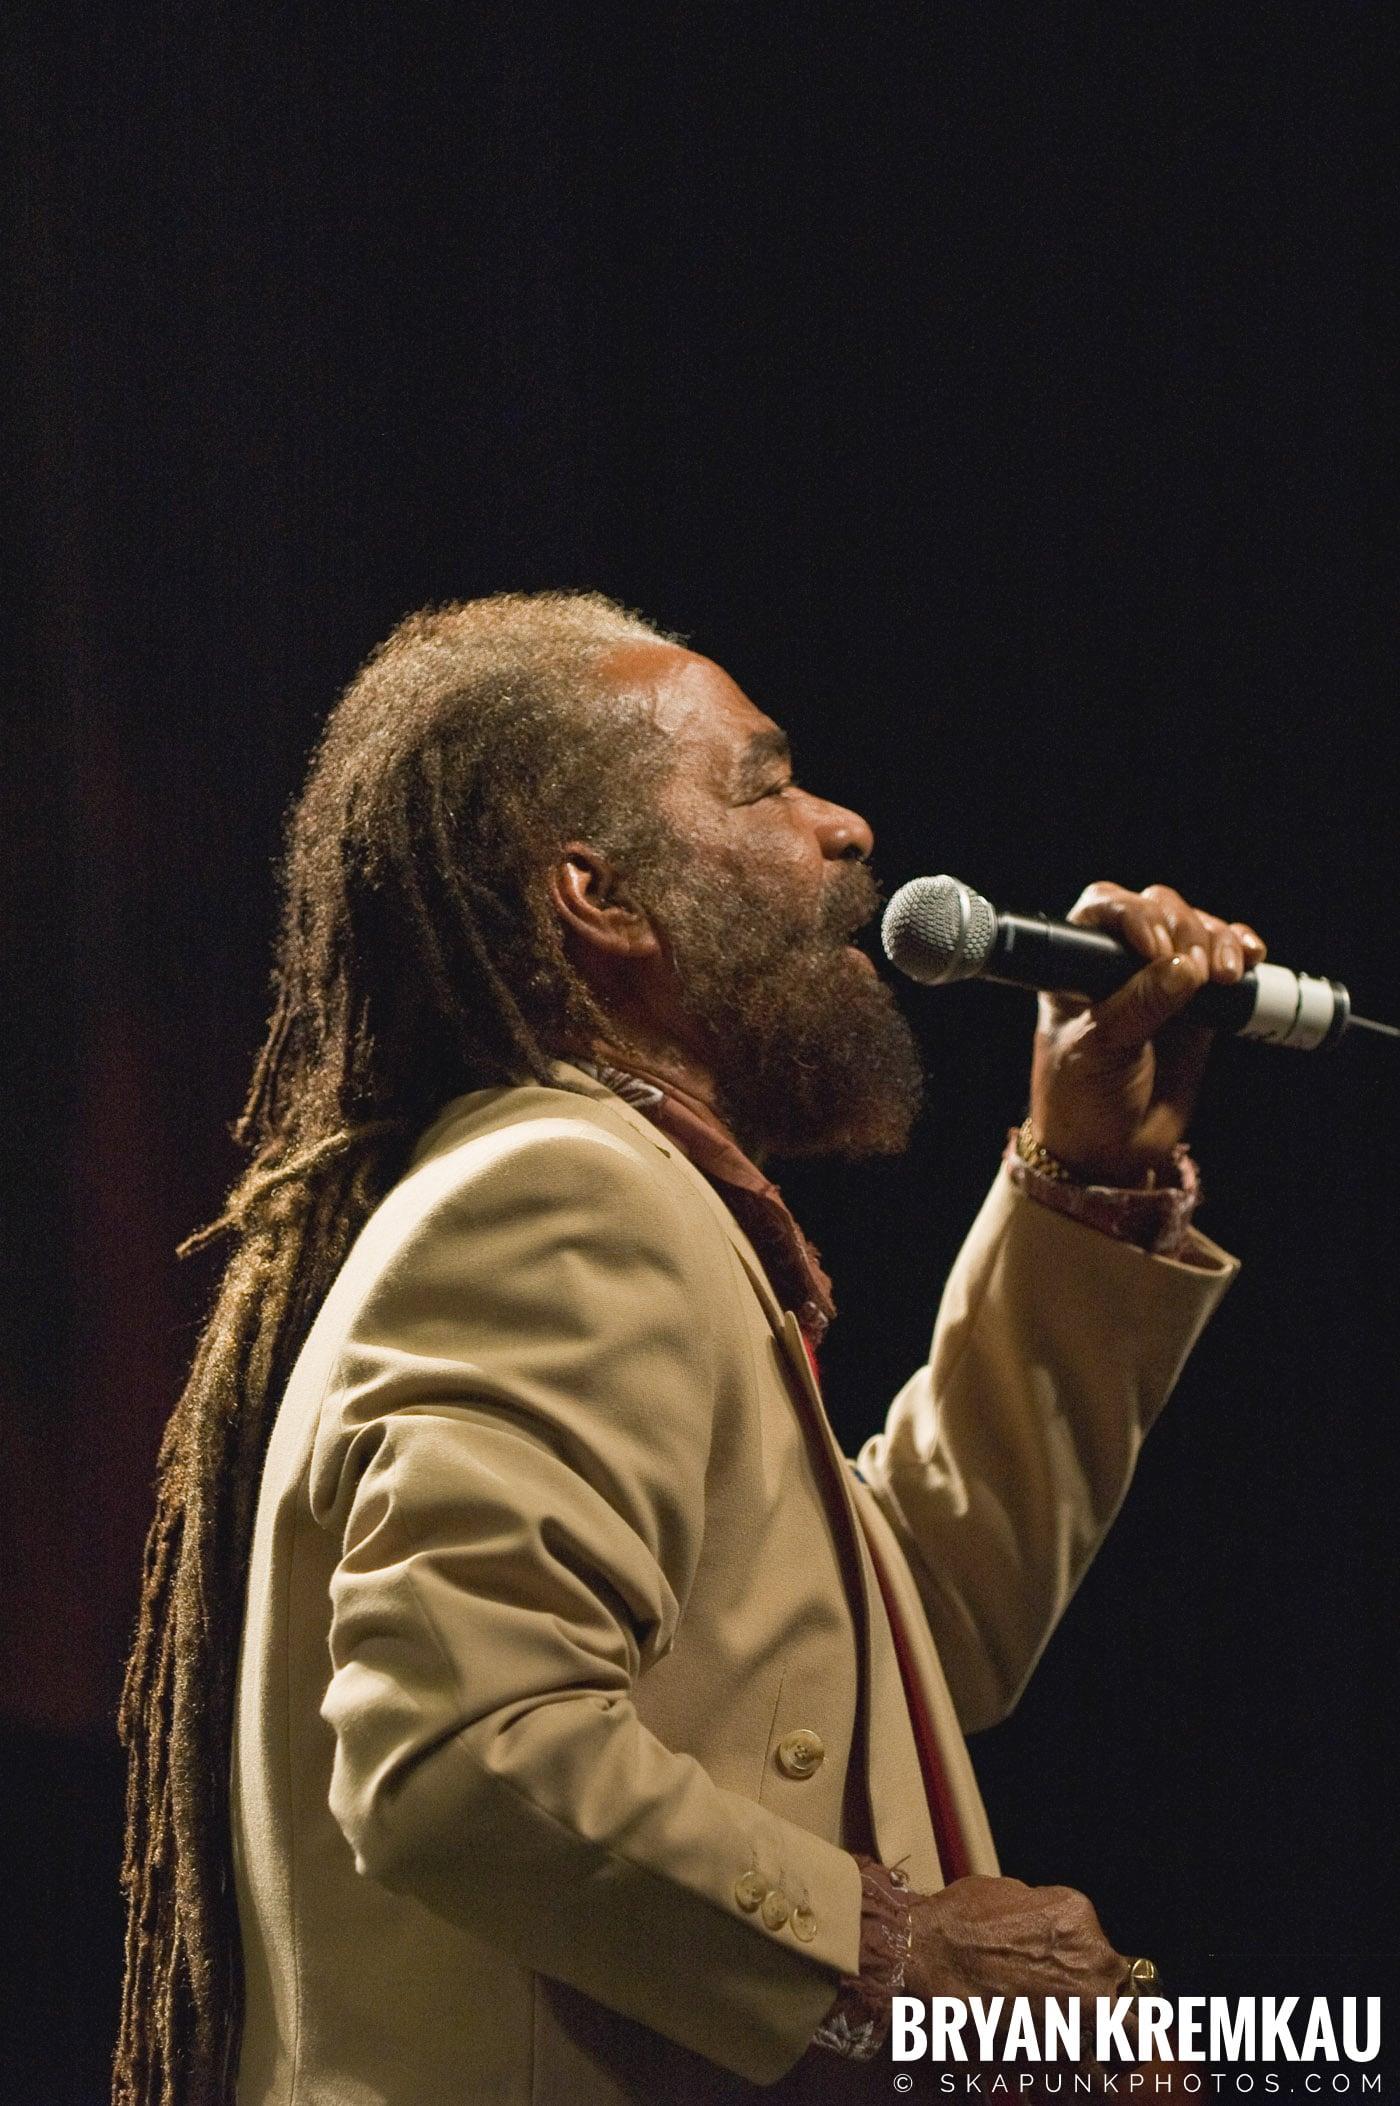 John Holt @ Vintage Reggae Fest - Hammerstein Ballroom, NYC - 12.16.07 (10)